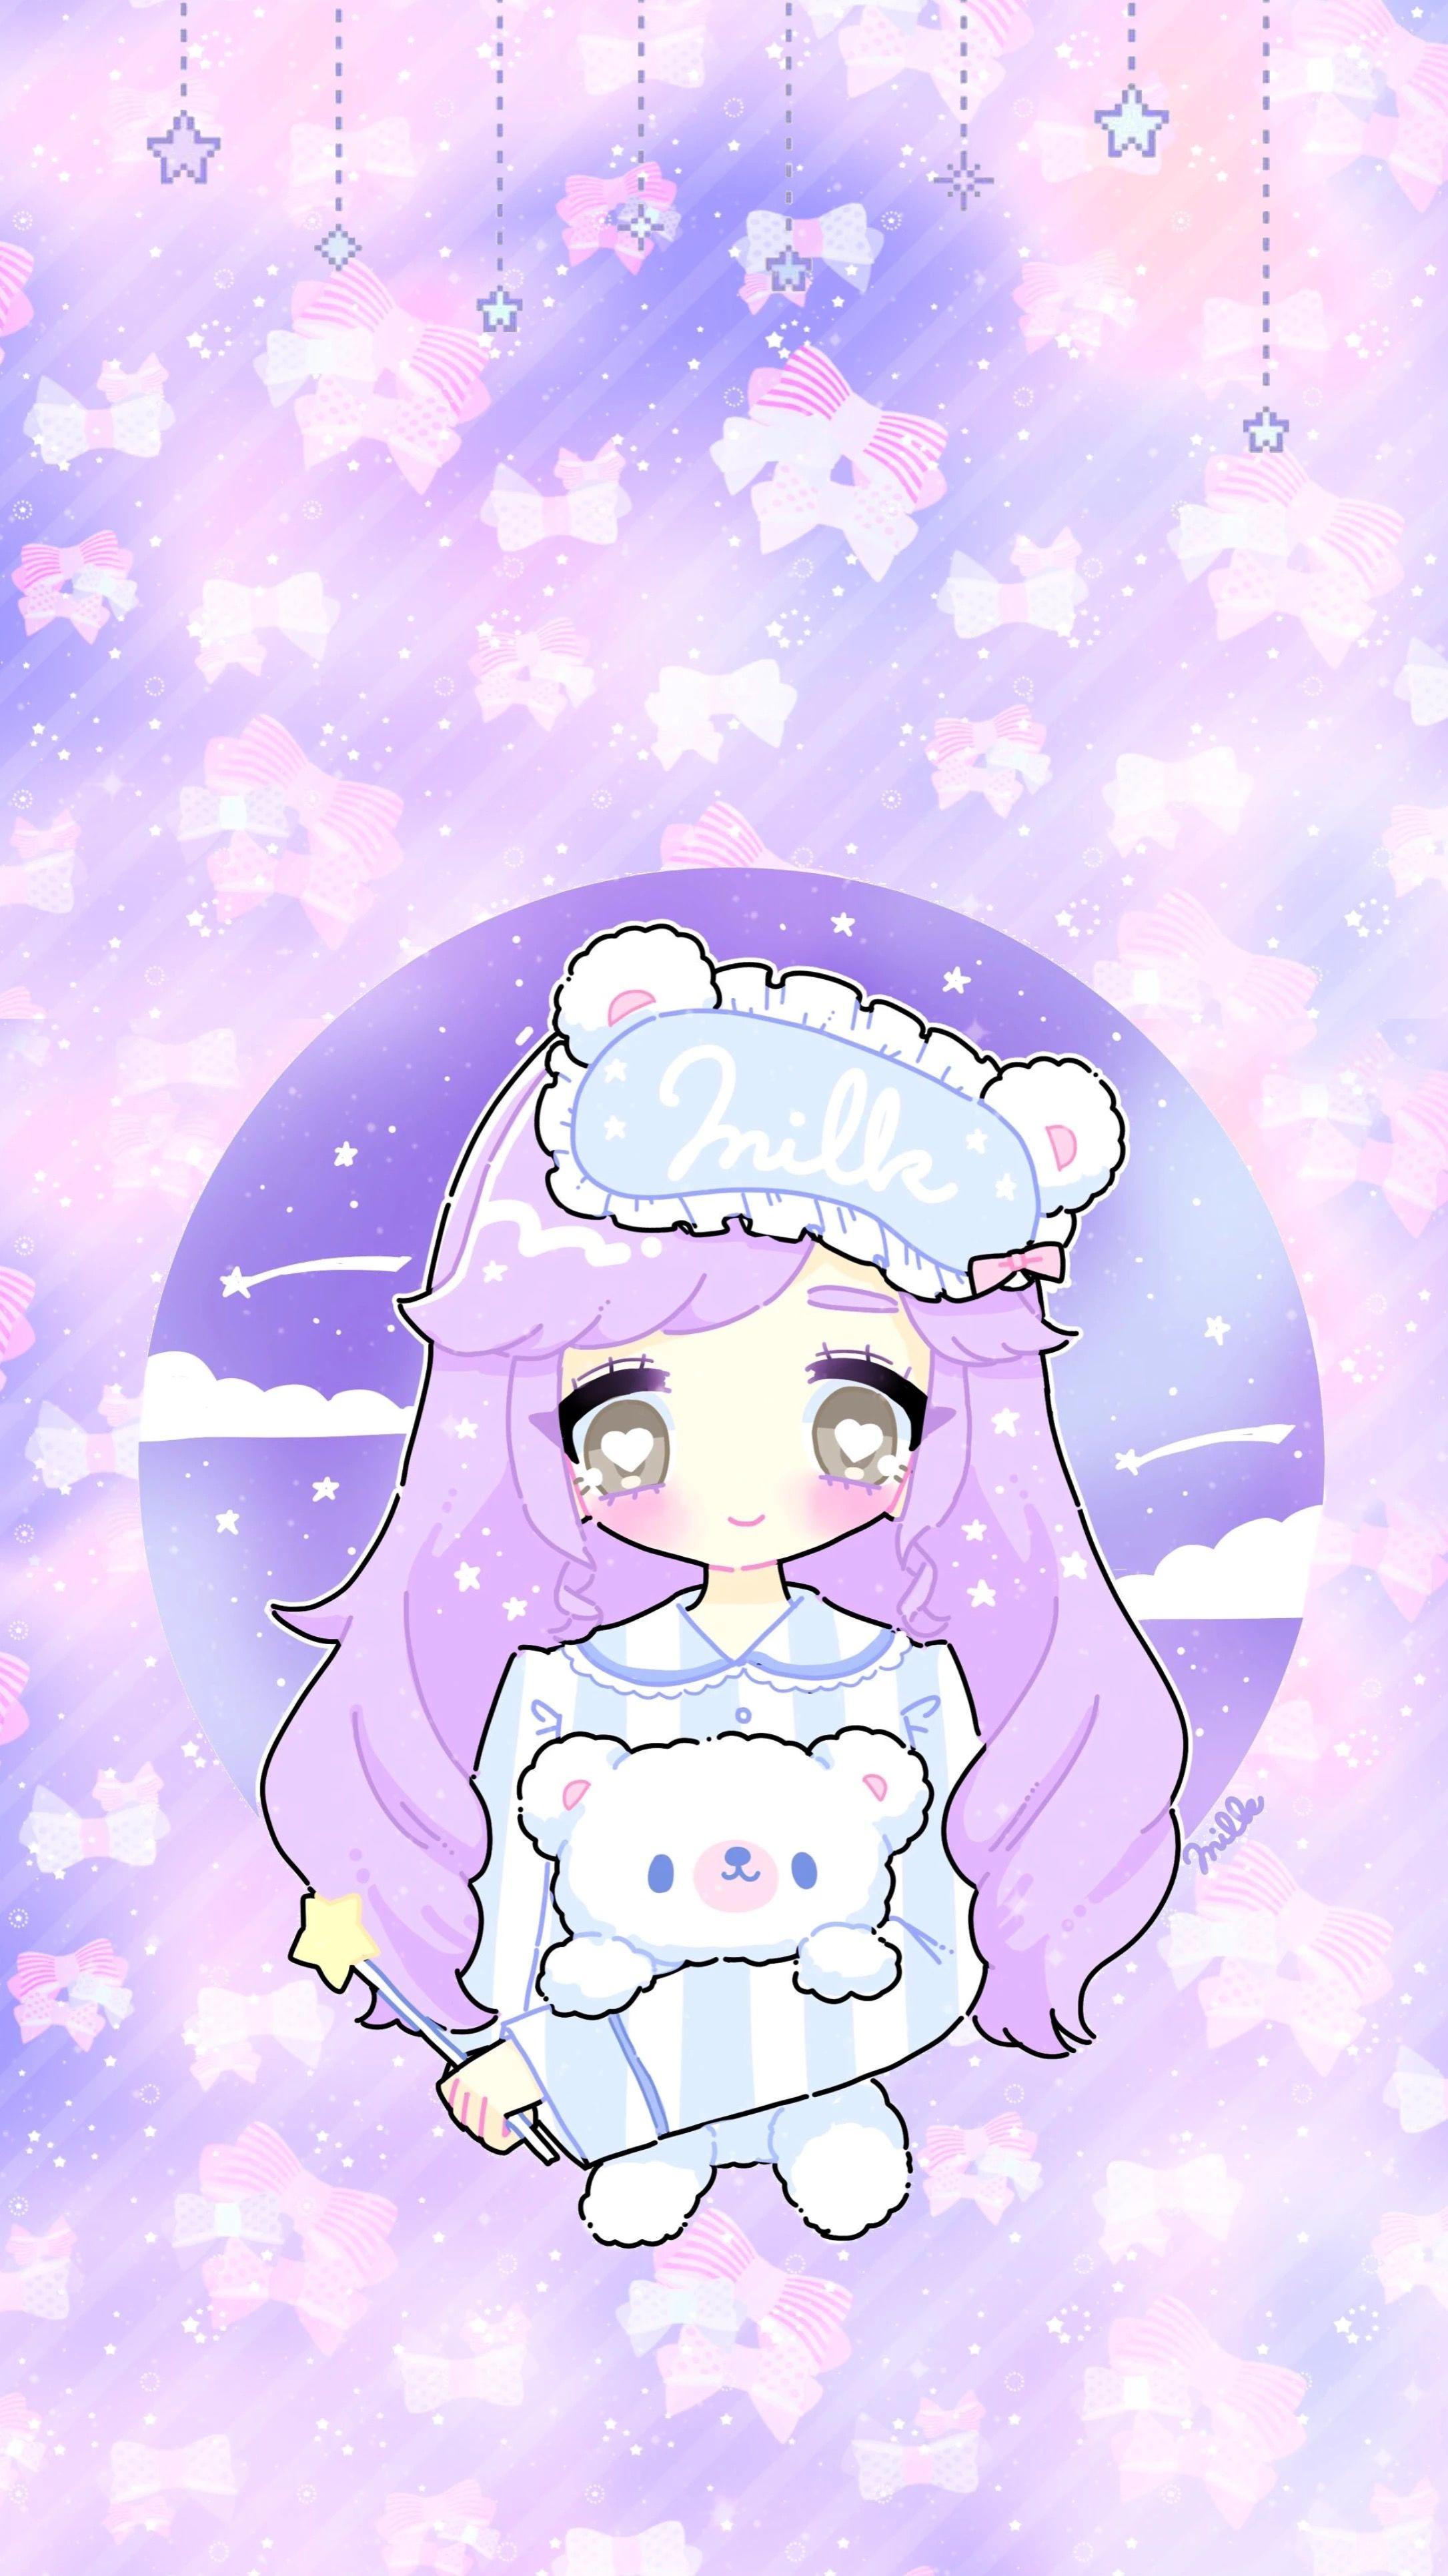 Kawaii Wallpaper Anime : kawaii, wallpaper, anime, ♡Dari, Cartoon, Kawaii, Background,, Wallpaper,, Wallpapers